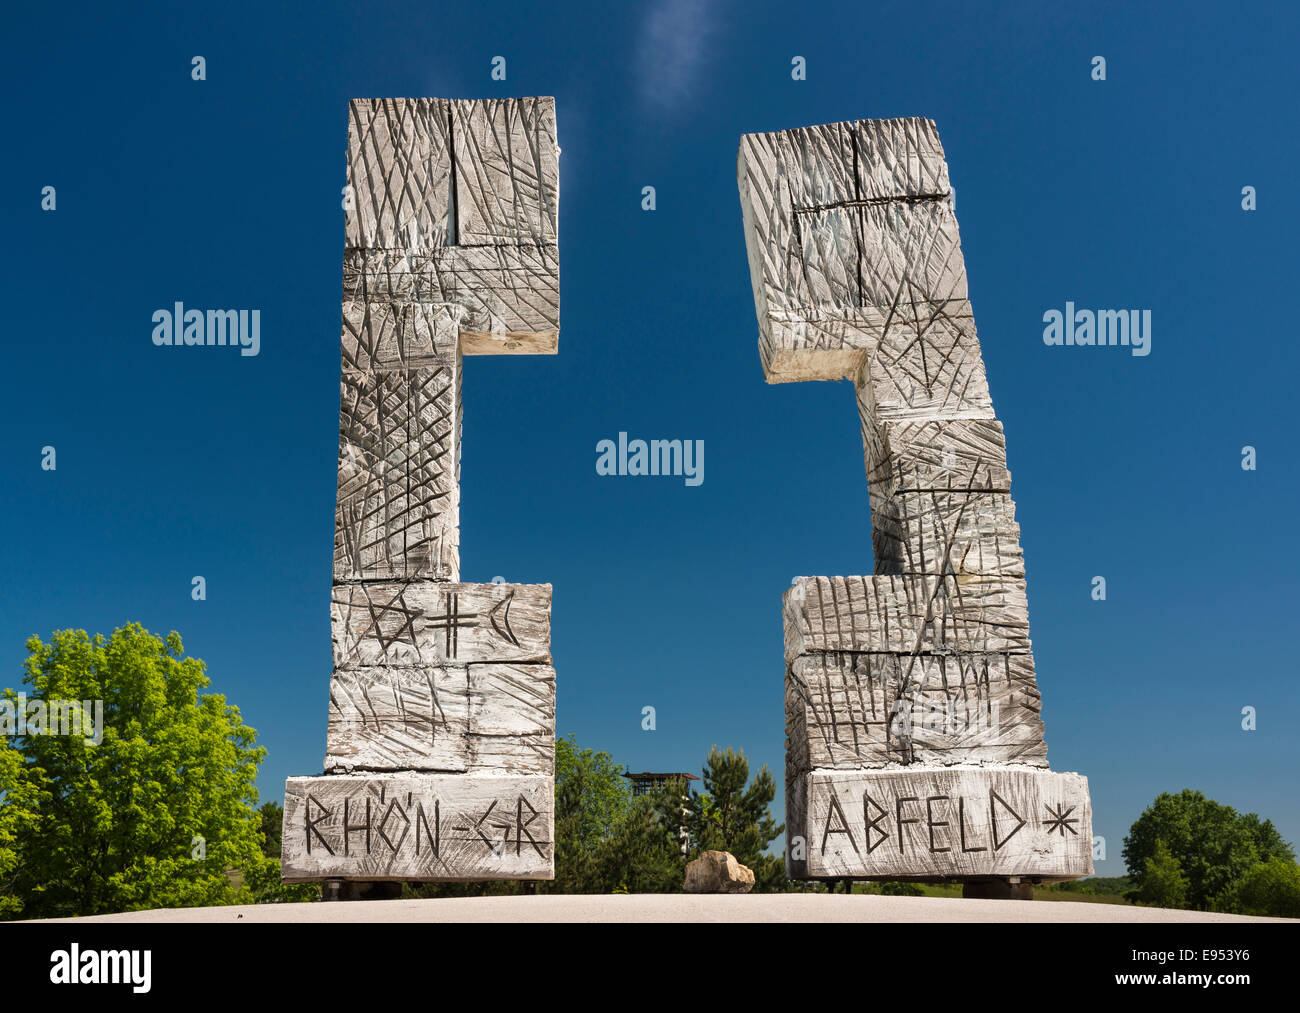 Installation 'Open Cross - a border overcome', 2010, artist Gernot Ehrsam, Skulpturenpark Deutsche Einheit - Stock Image